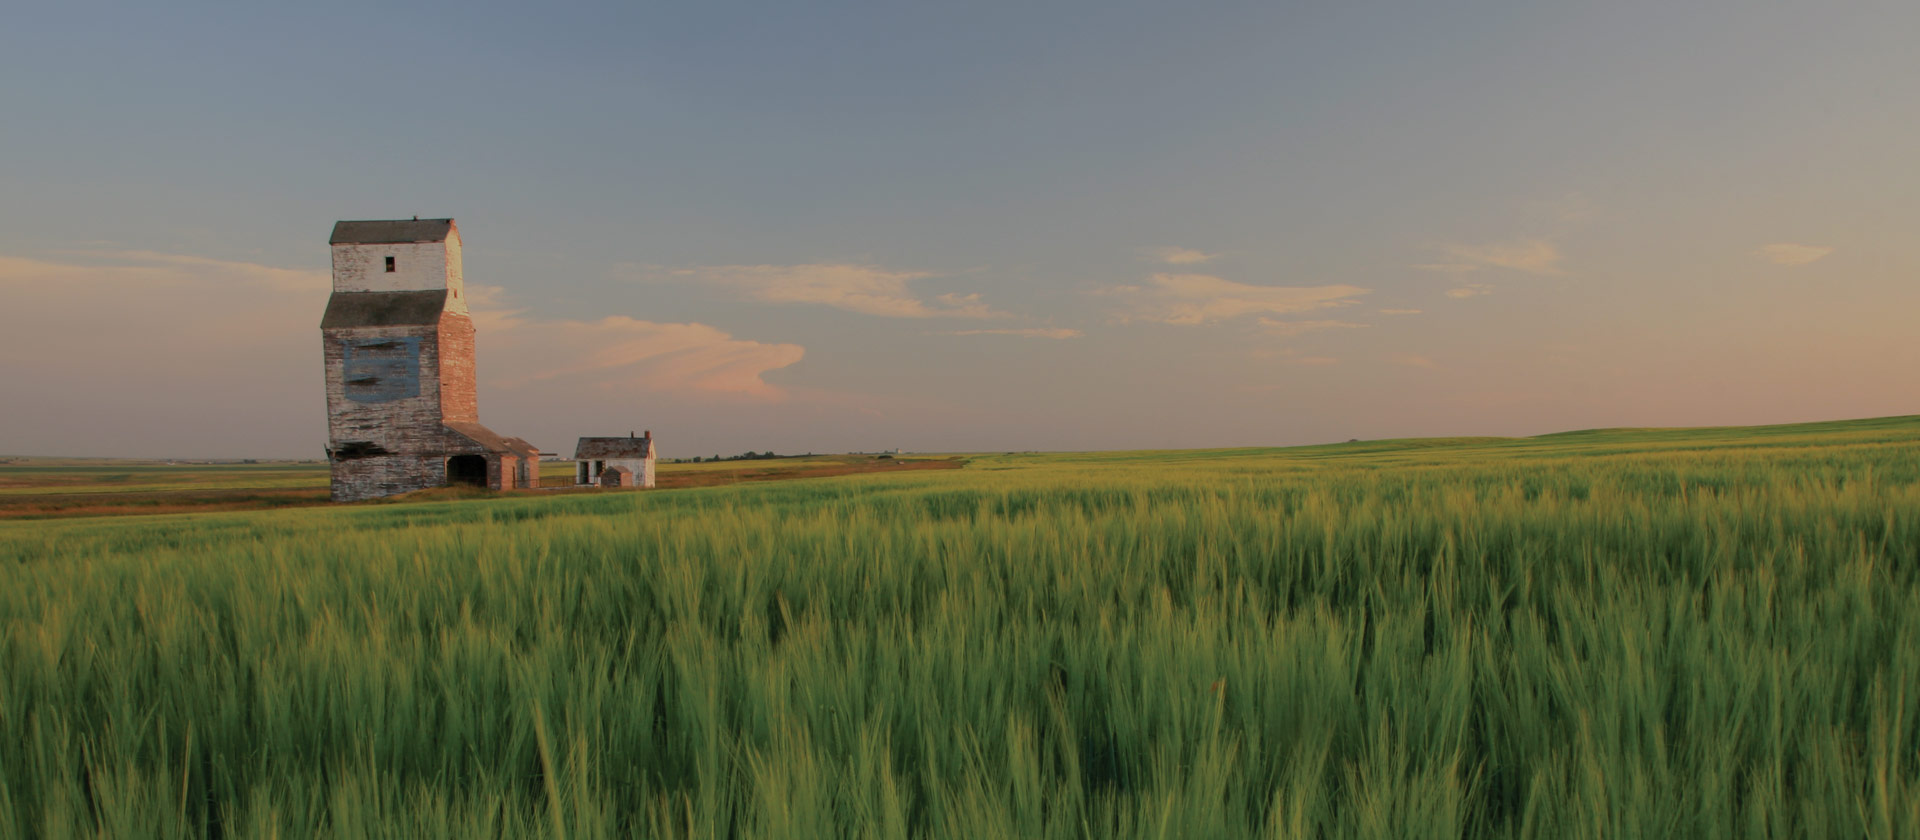 Wooden Grain Elevator on the Prairie